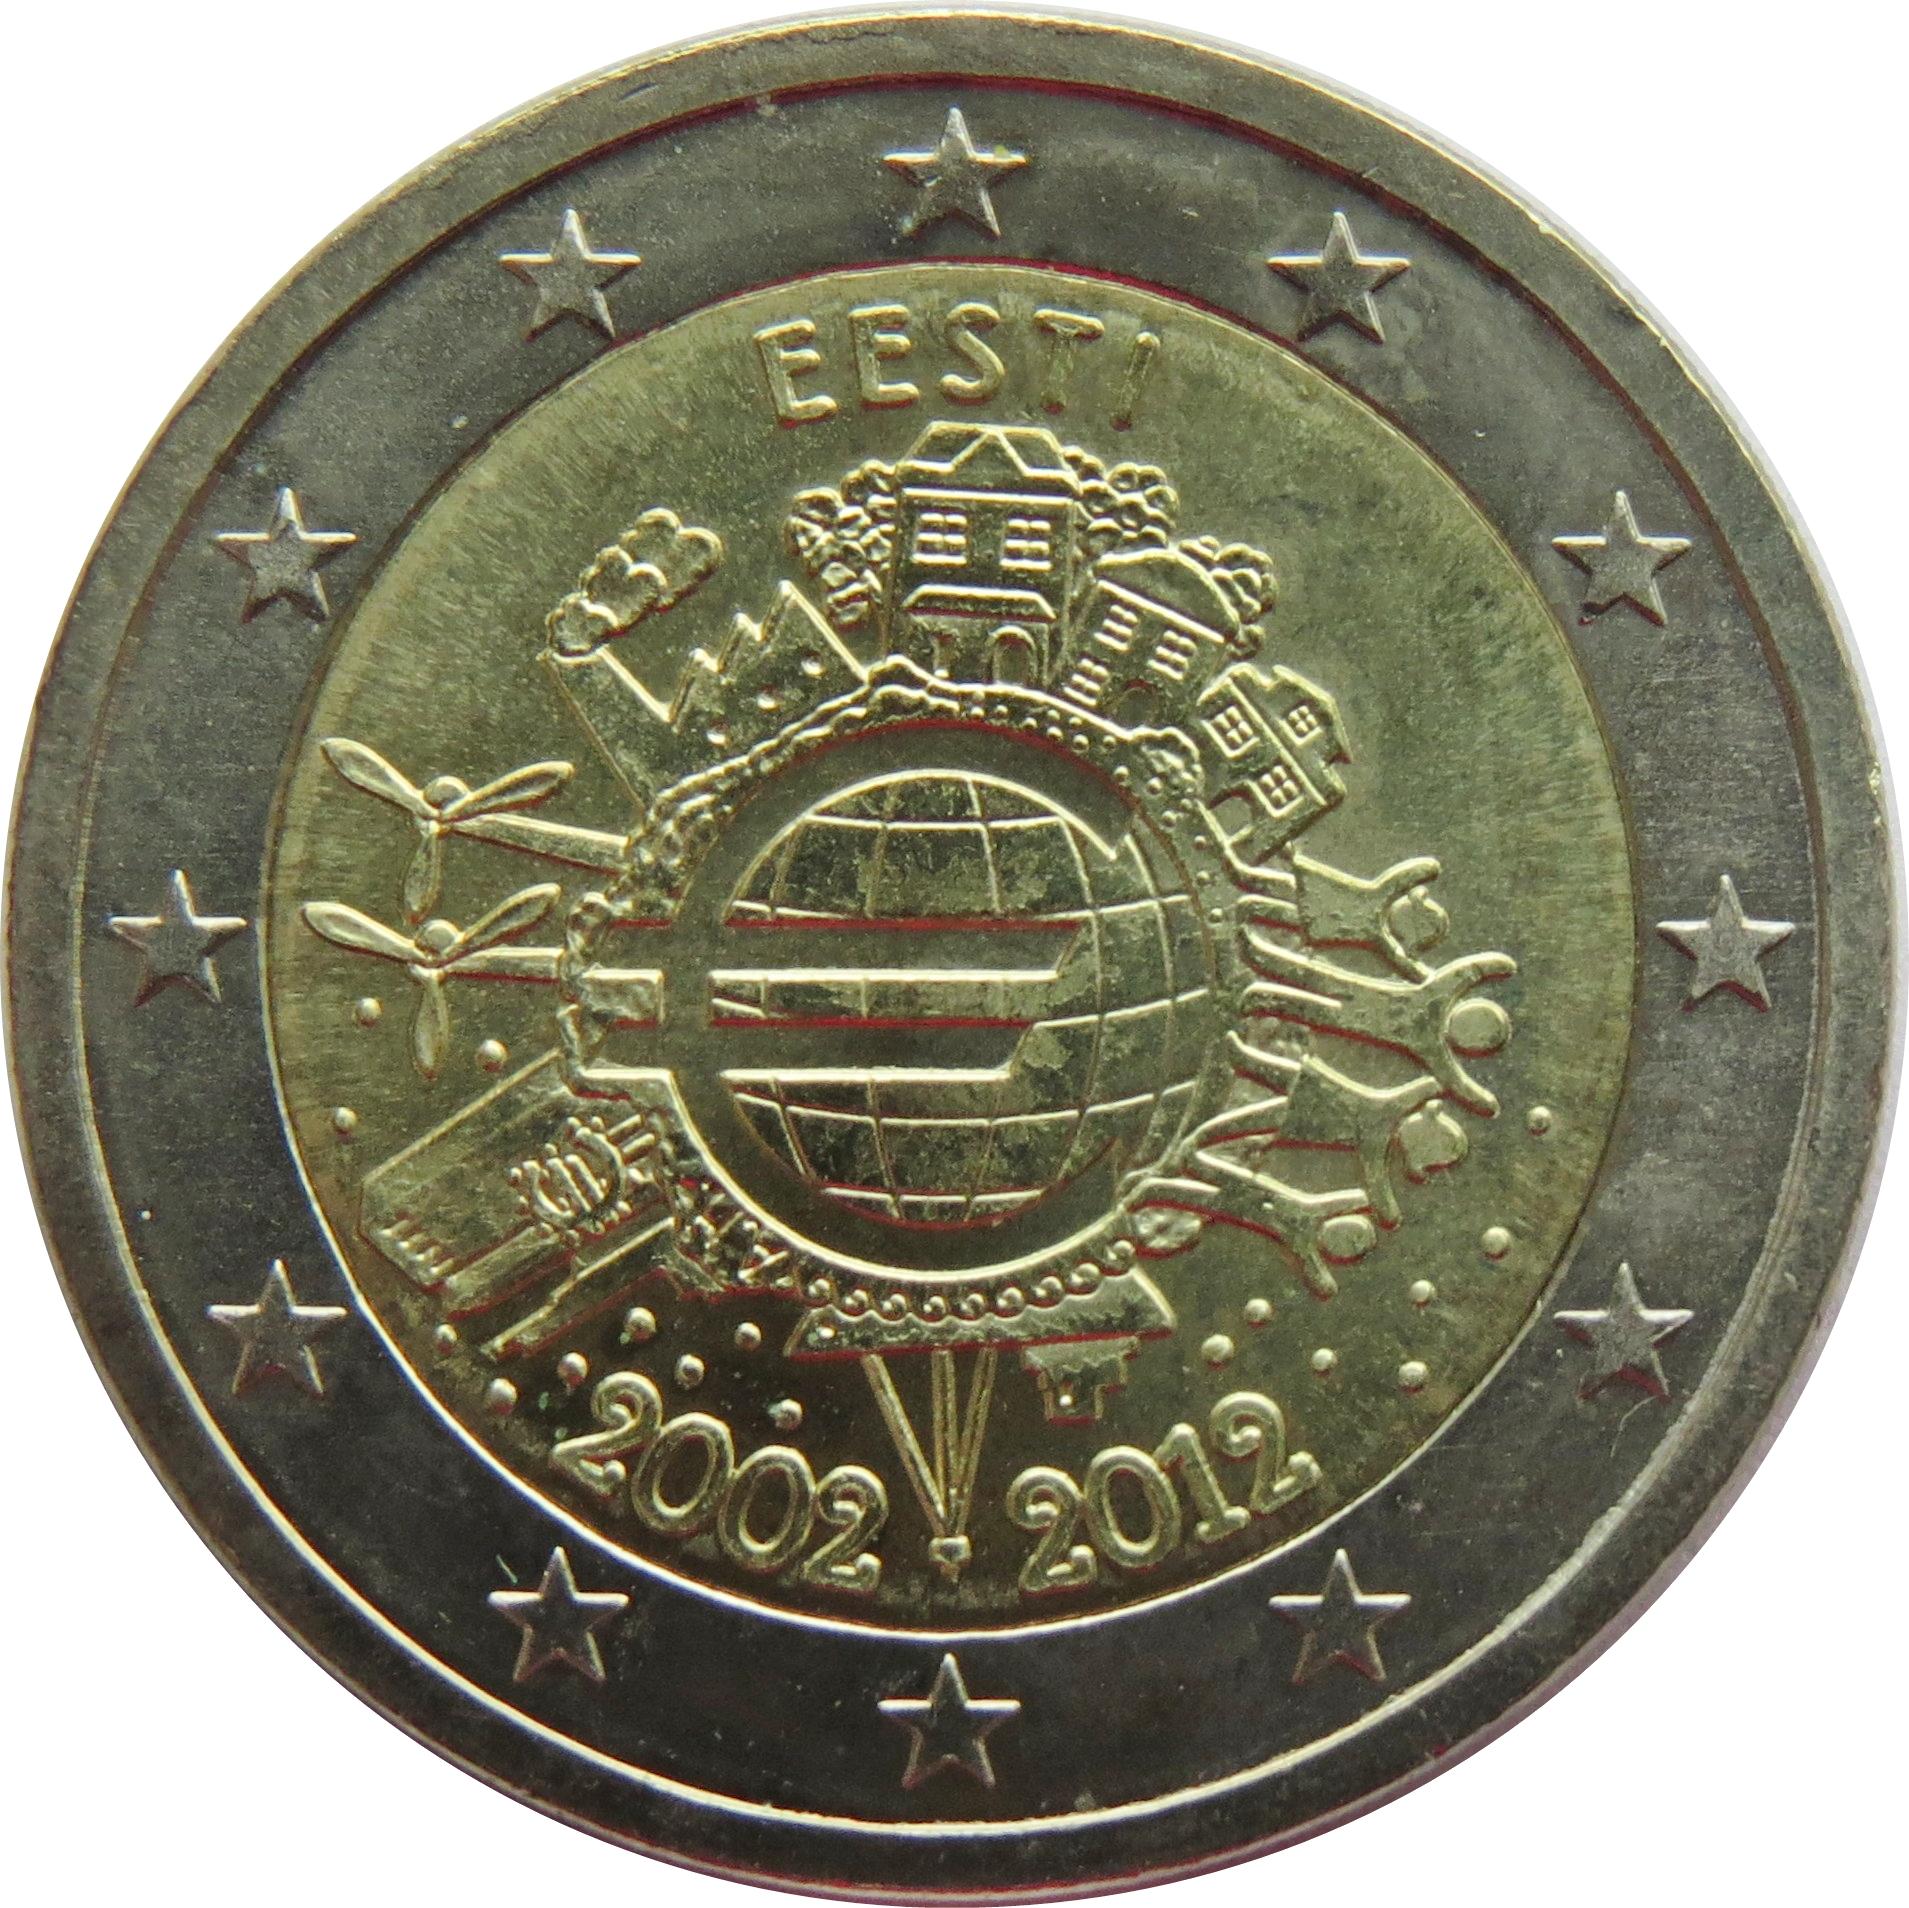 GERMANY 2 € common commemorative euro coin 2012 TYE Ten years of the Euro